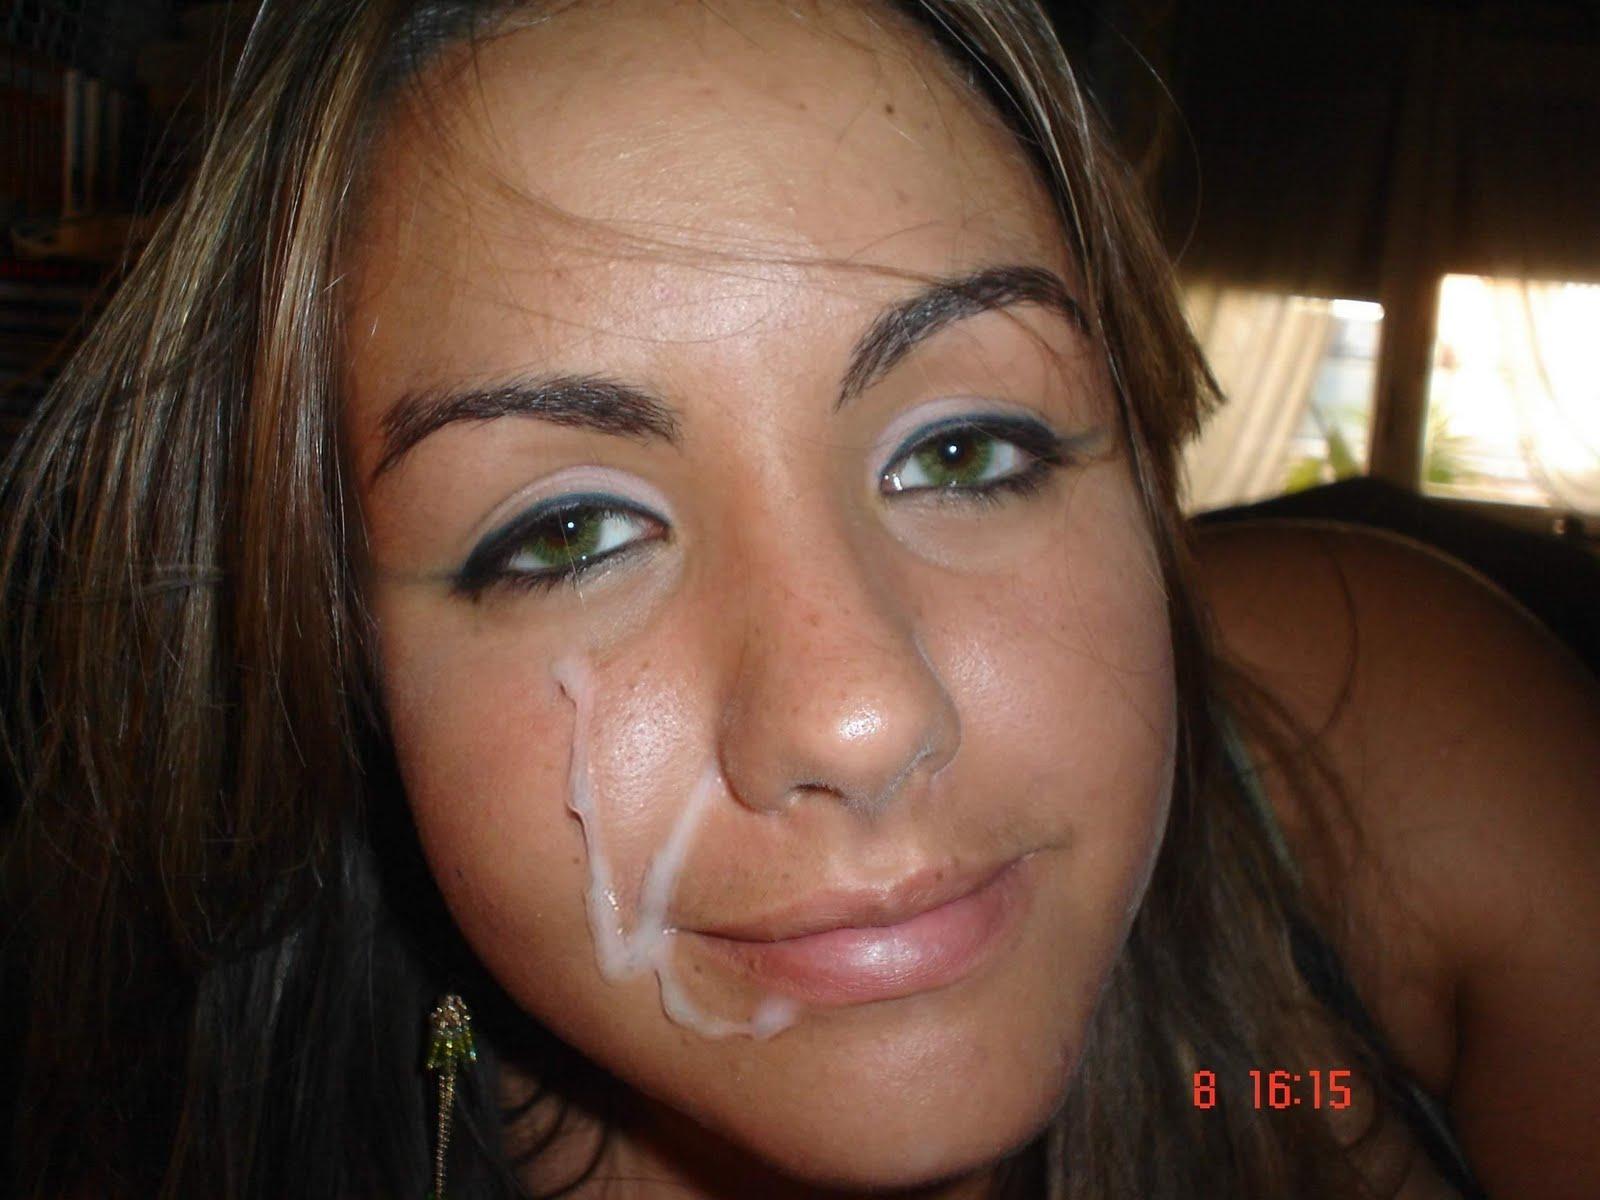 Cum free pic facial shot